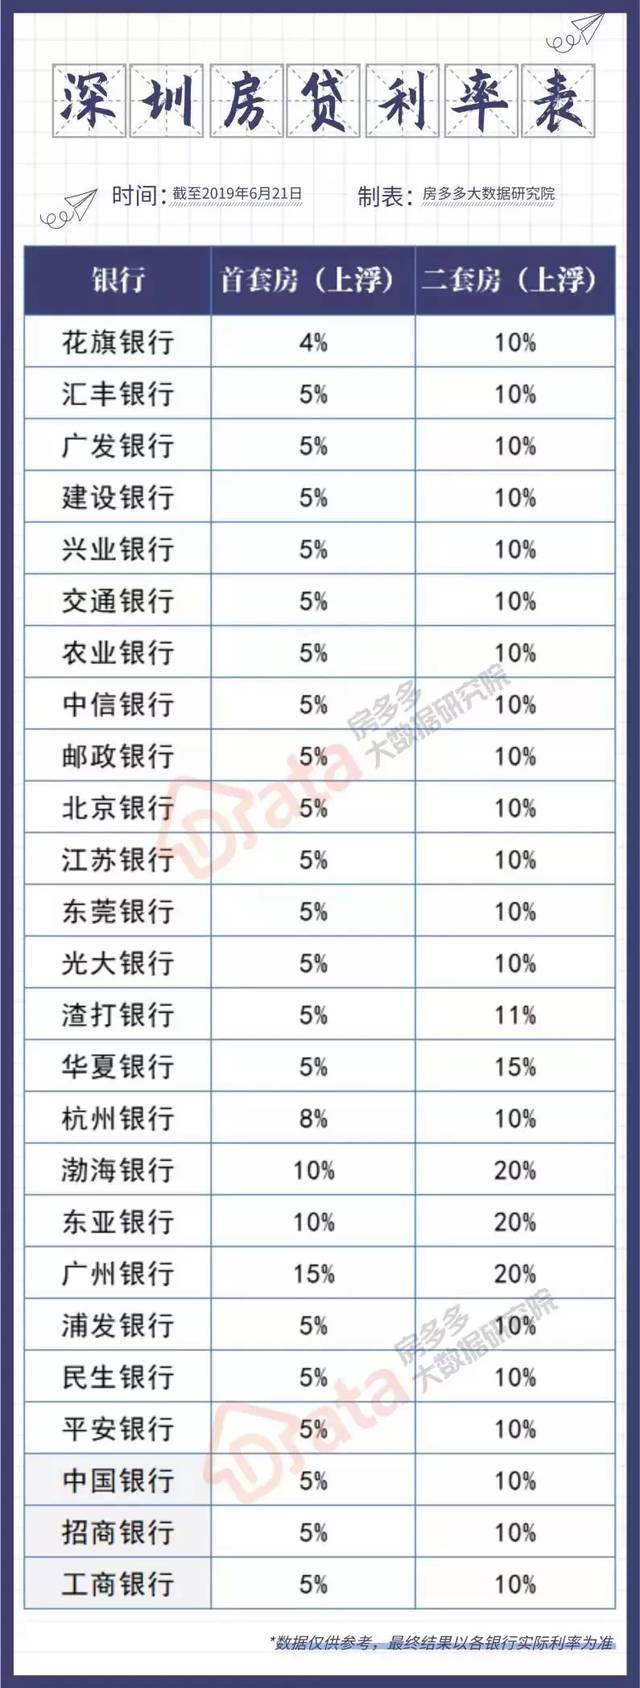 http://www.inrv.net/fangchanshichang/1185803.html